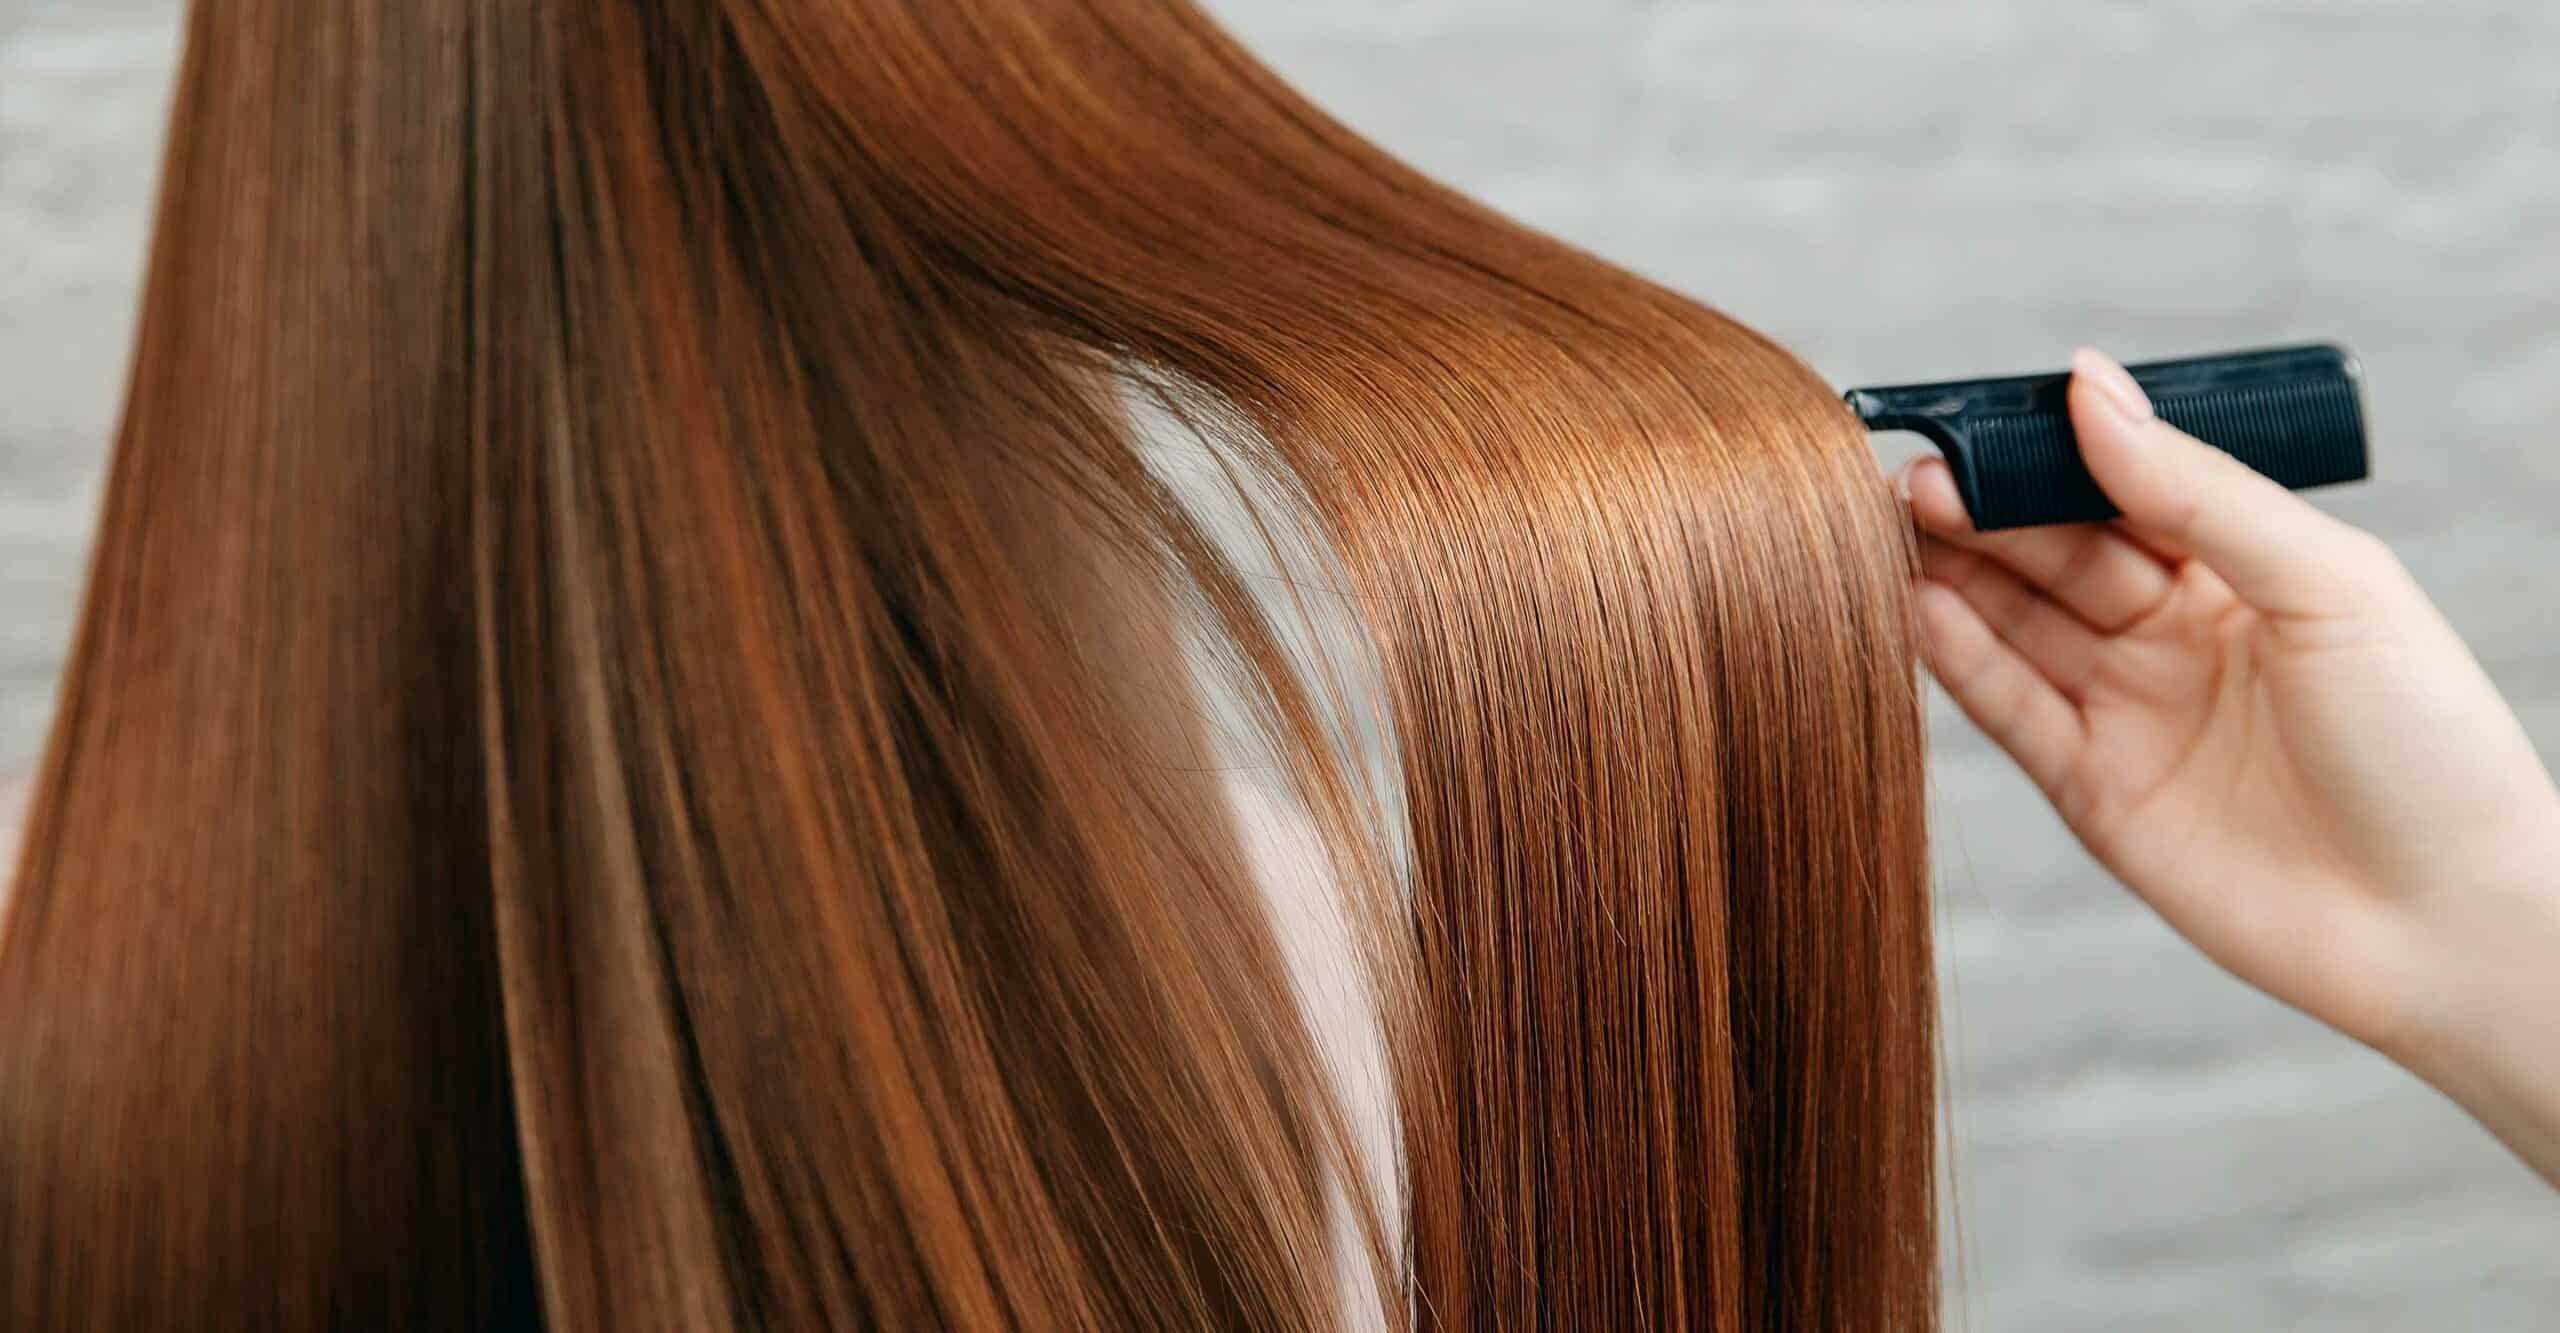 combinging hair